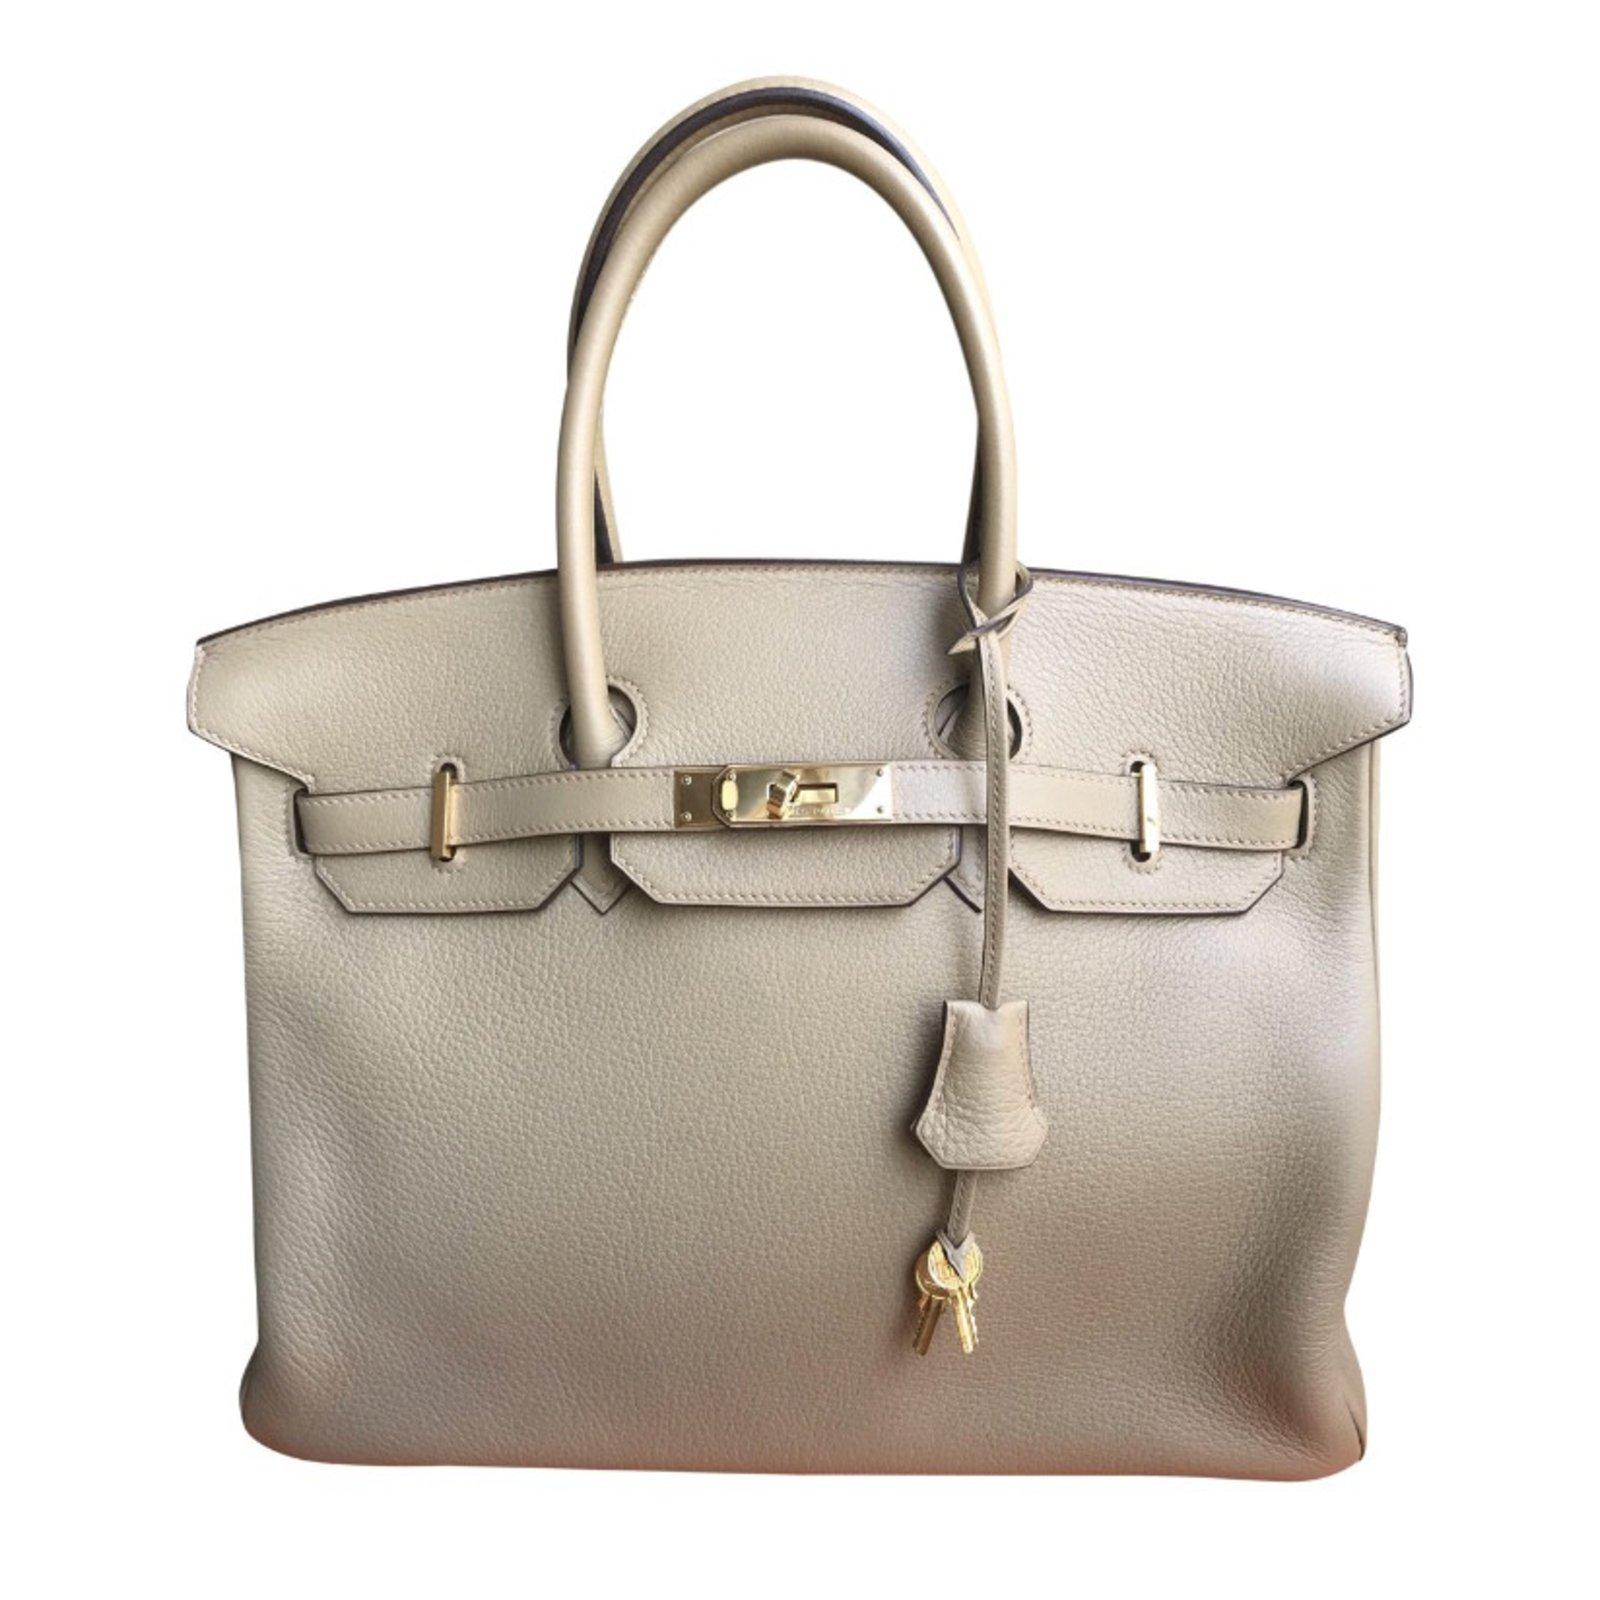 Sacs à main Hermès Birkin 35 cuir clémence Cuir Beige ref.71636 ... eaccf89ed4f